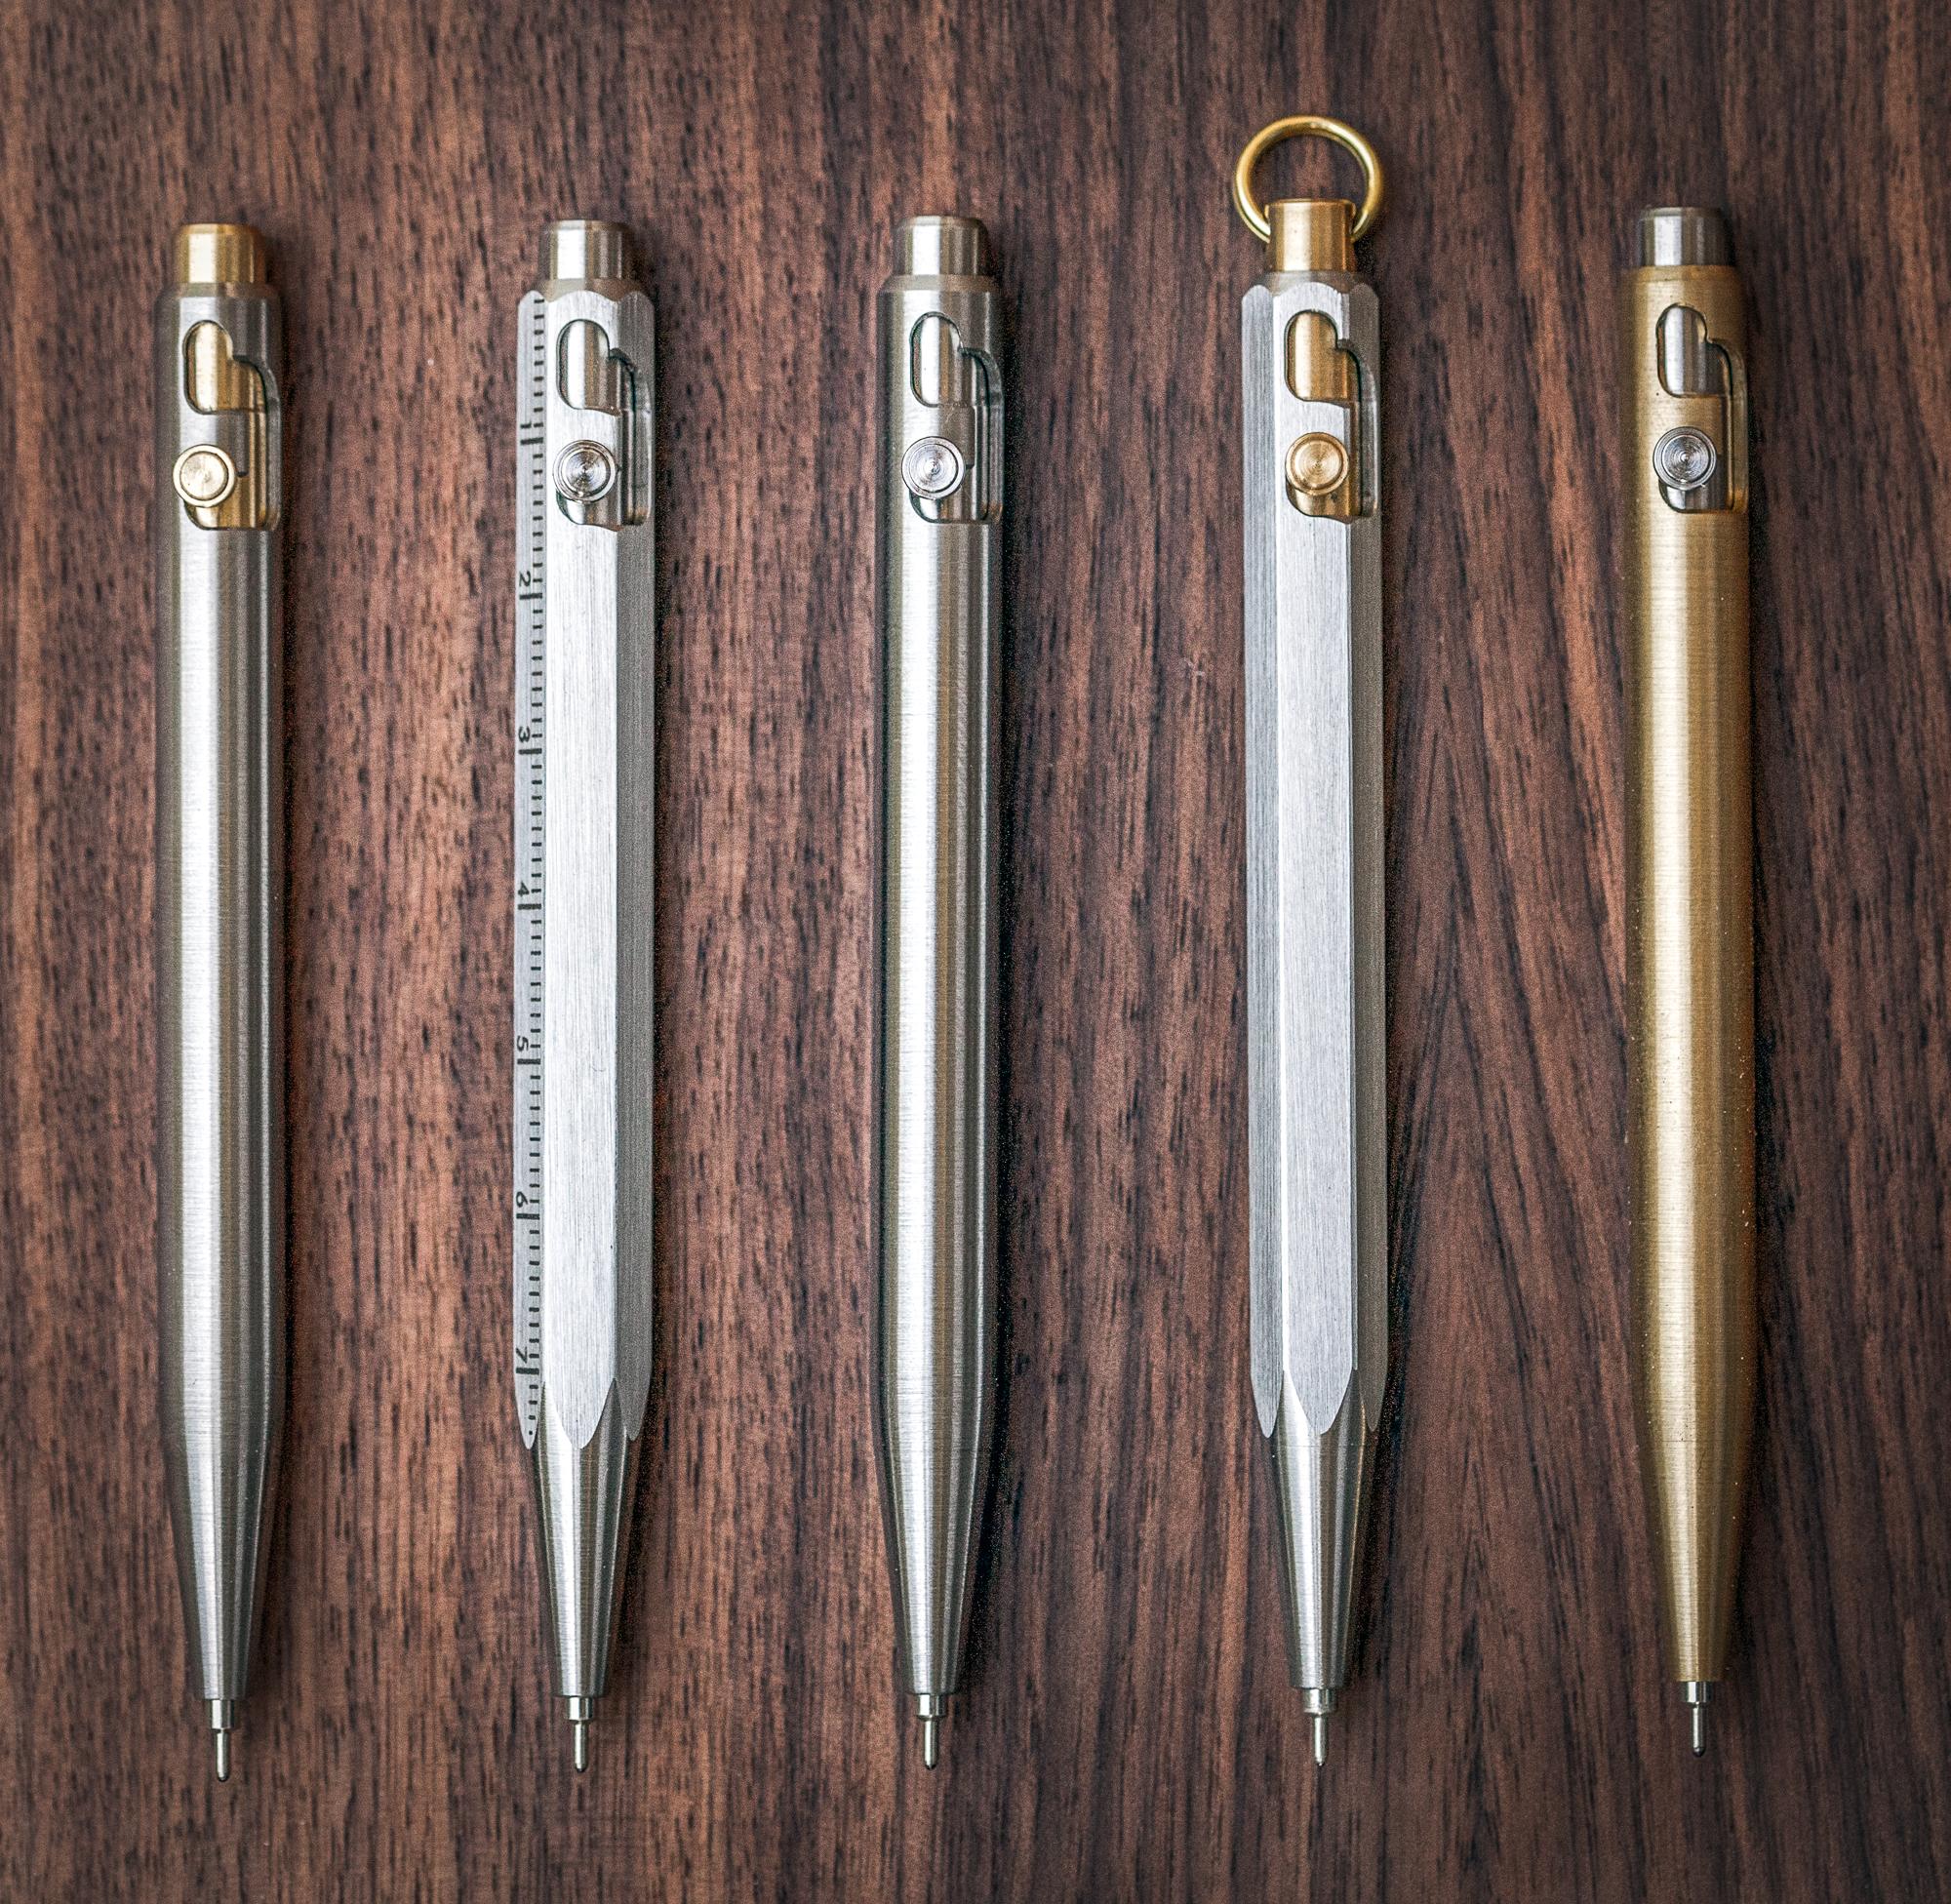 EDC Pocket Bolt Pens Group